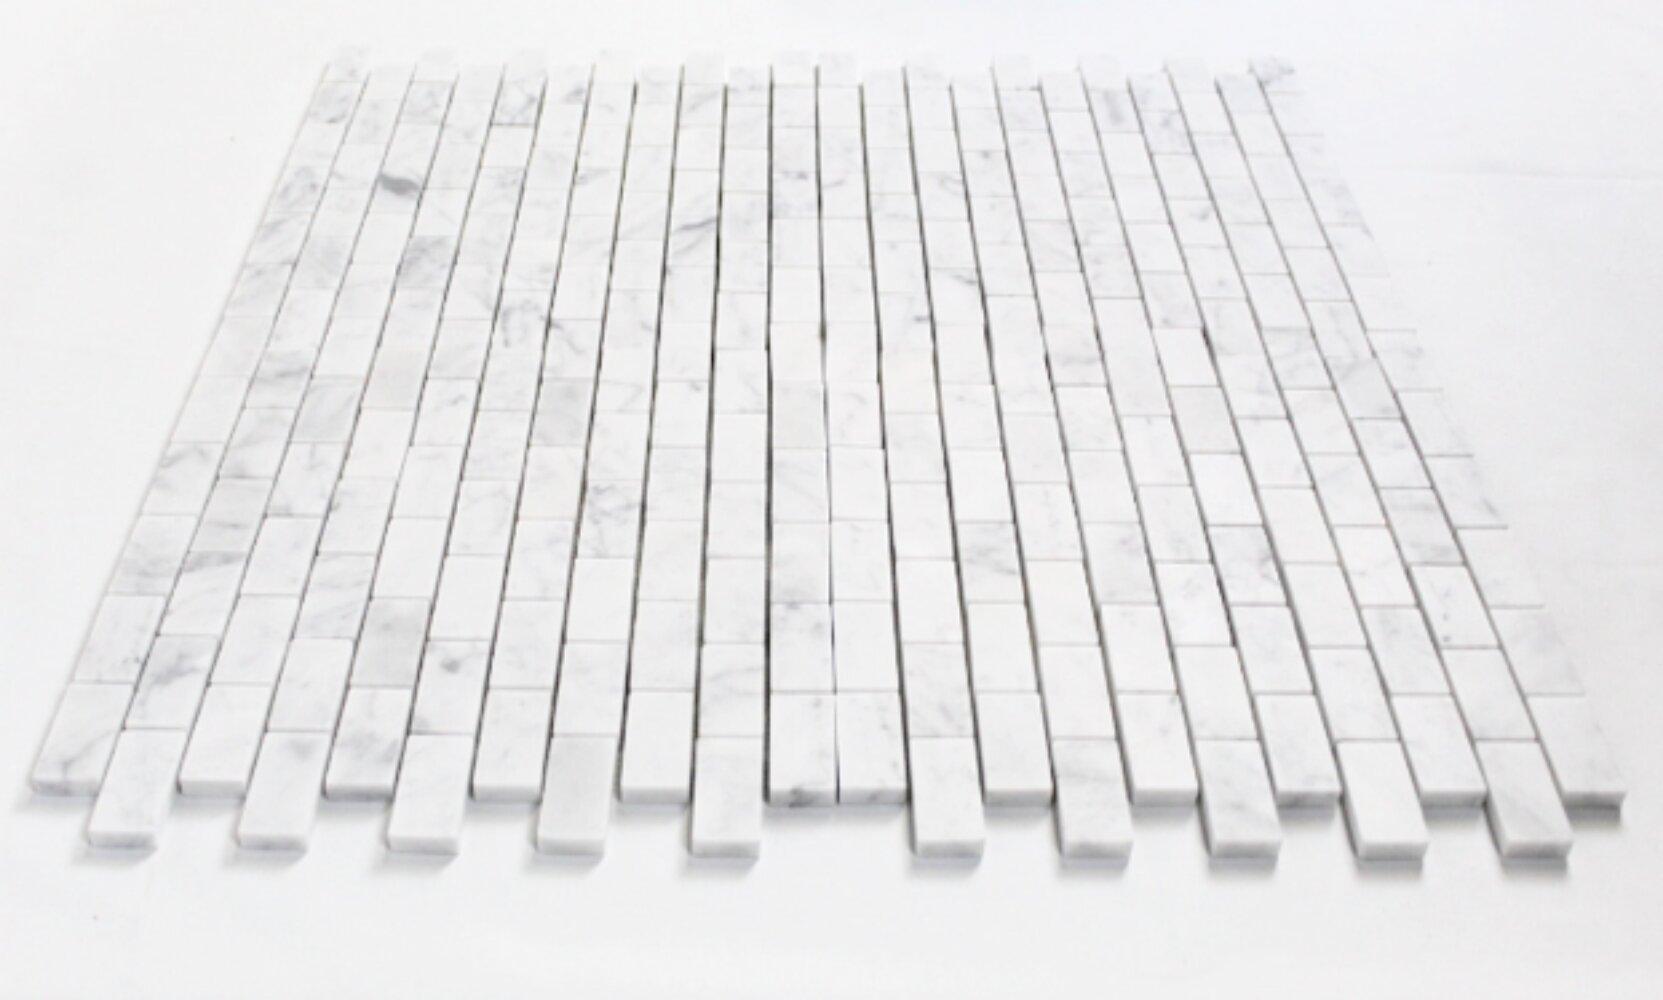 Rosabiancatileandstonellc Bianco Carrara 1 X 2 Marble Brick Joint Mosaic Wall Floor Tile Wayfair